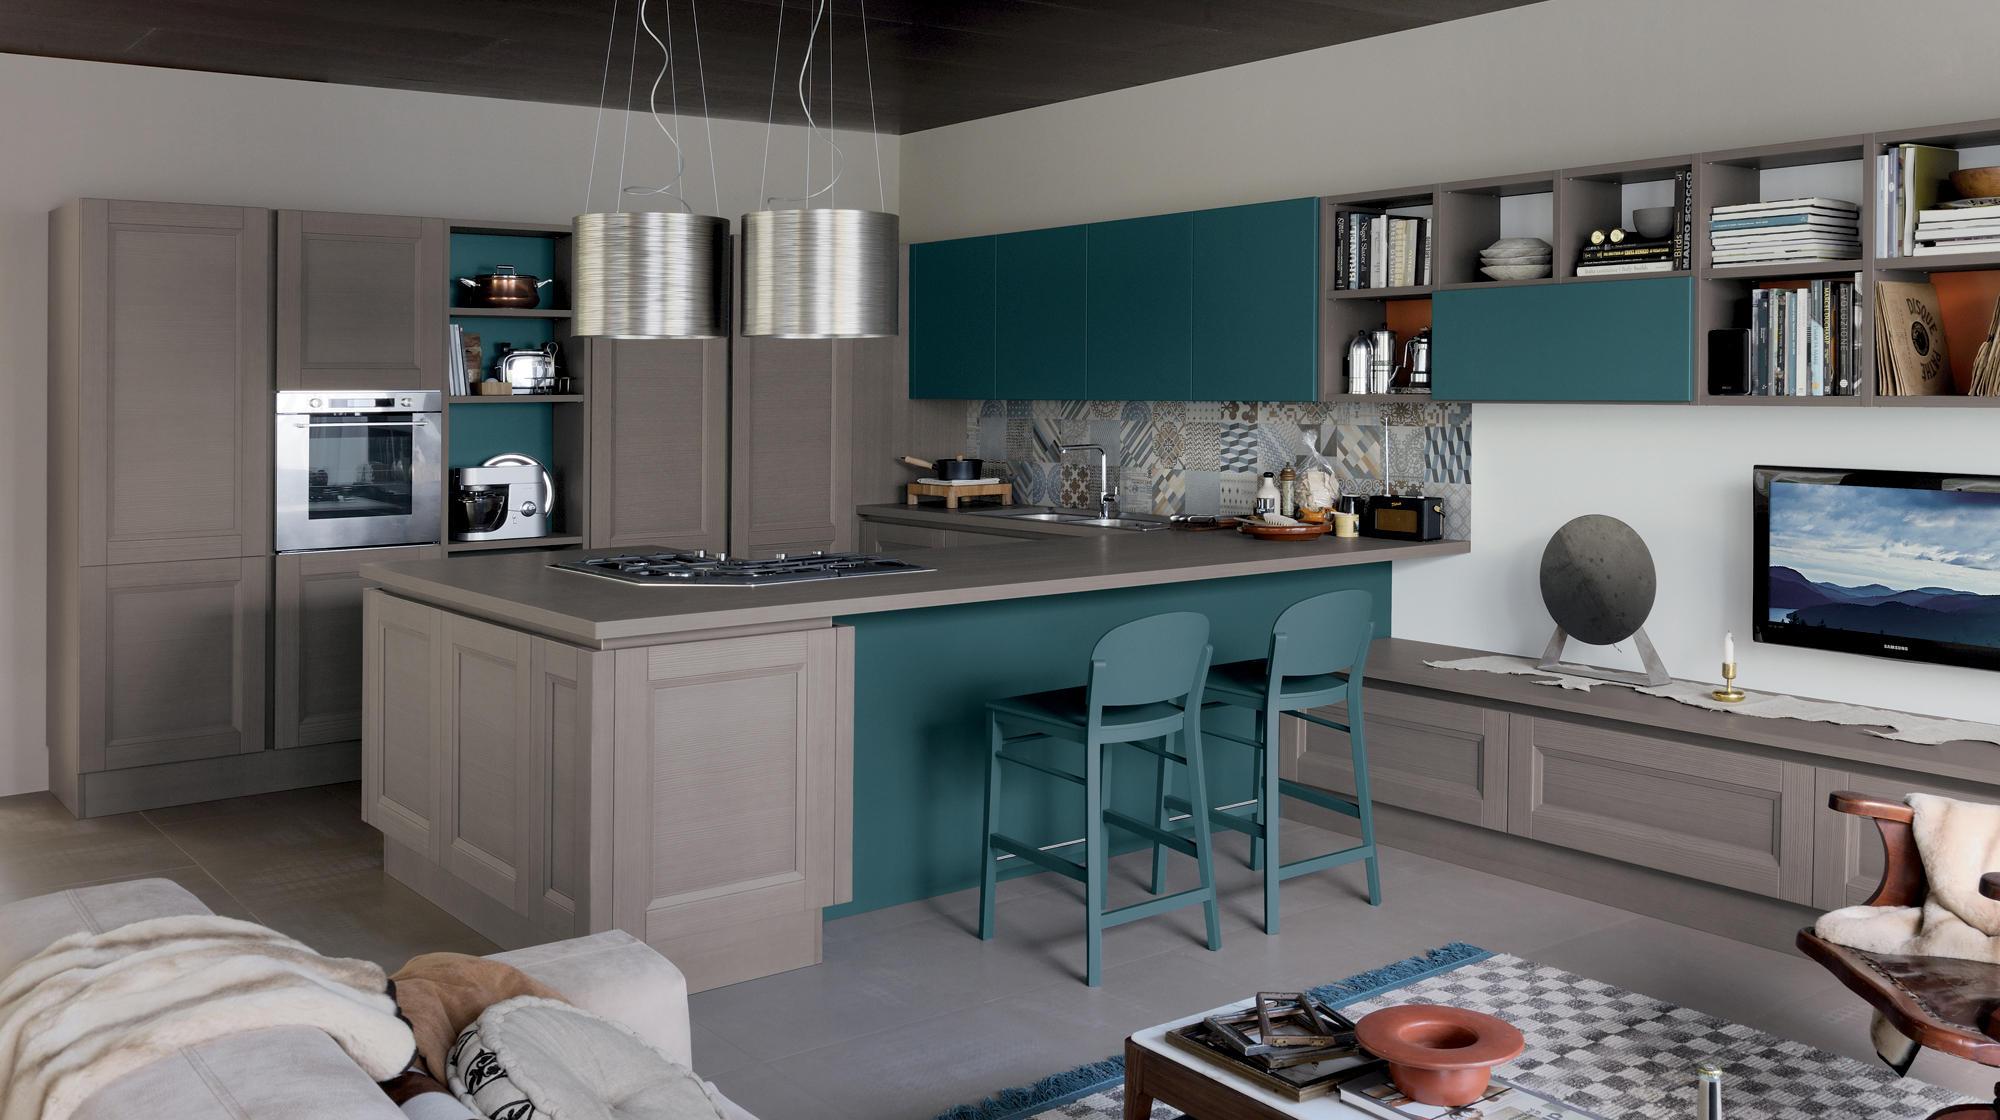 Vintage shellsystem fitted kitchens from veneta cucine - Veneta cucine ...